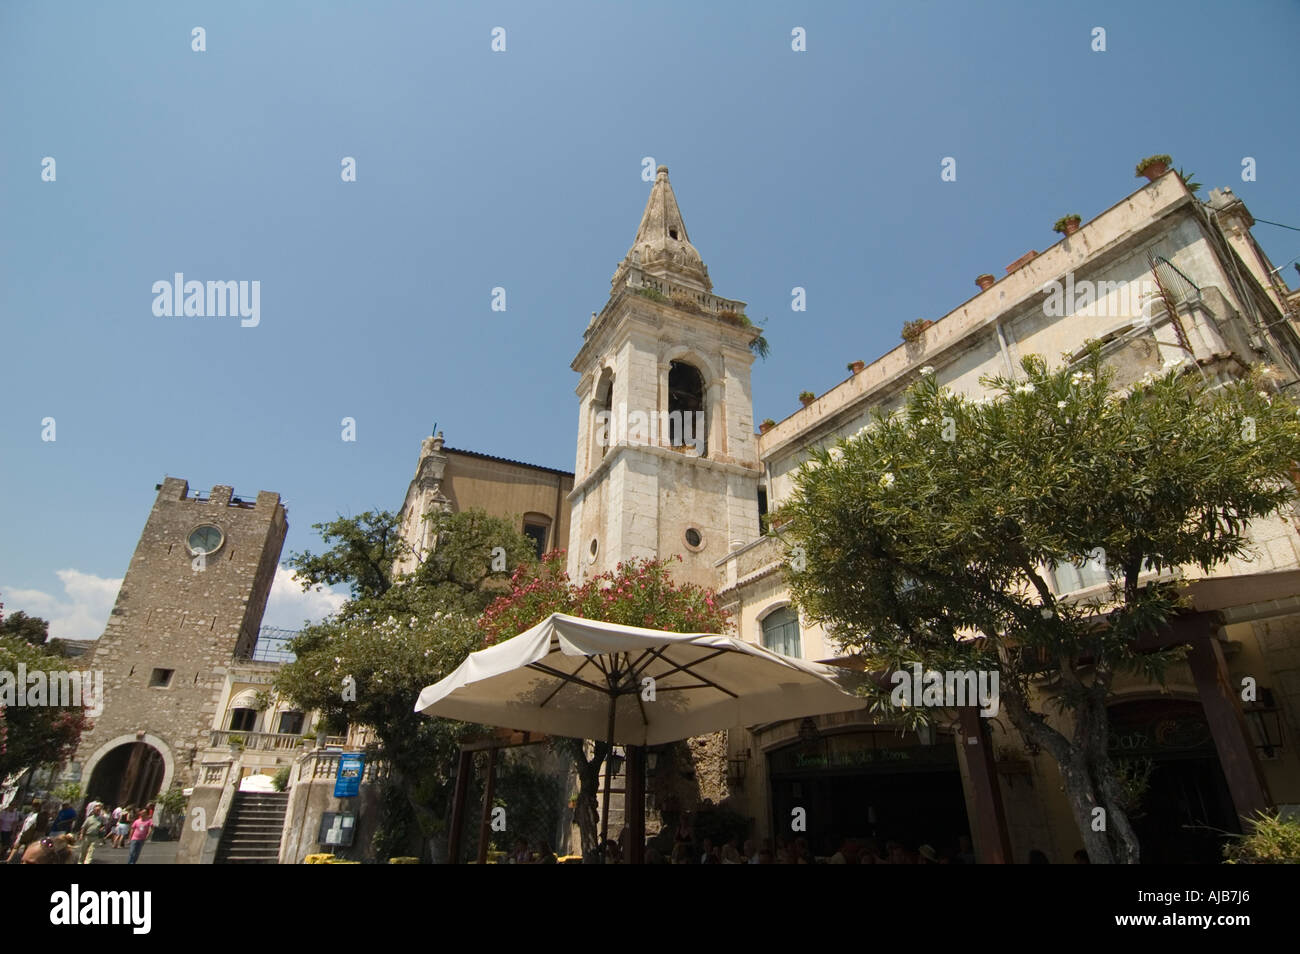 Chiesa di san Giuseppe Taormina Sicily Italy July 2006 - Stock Image